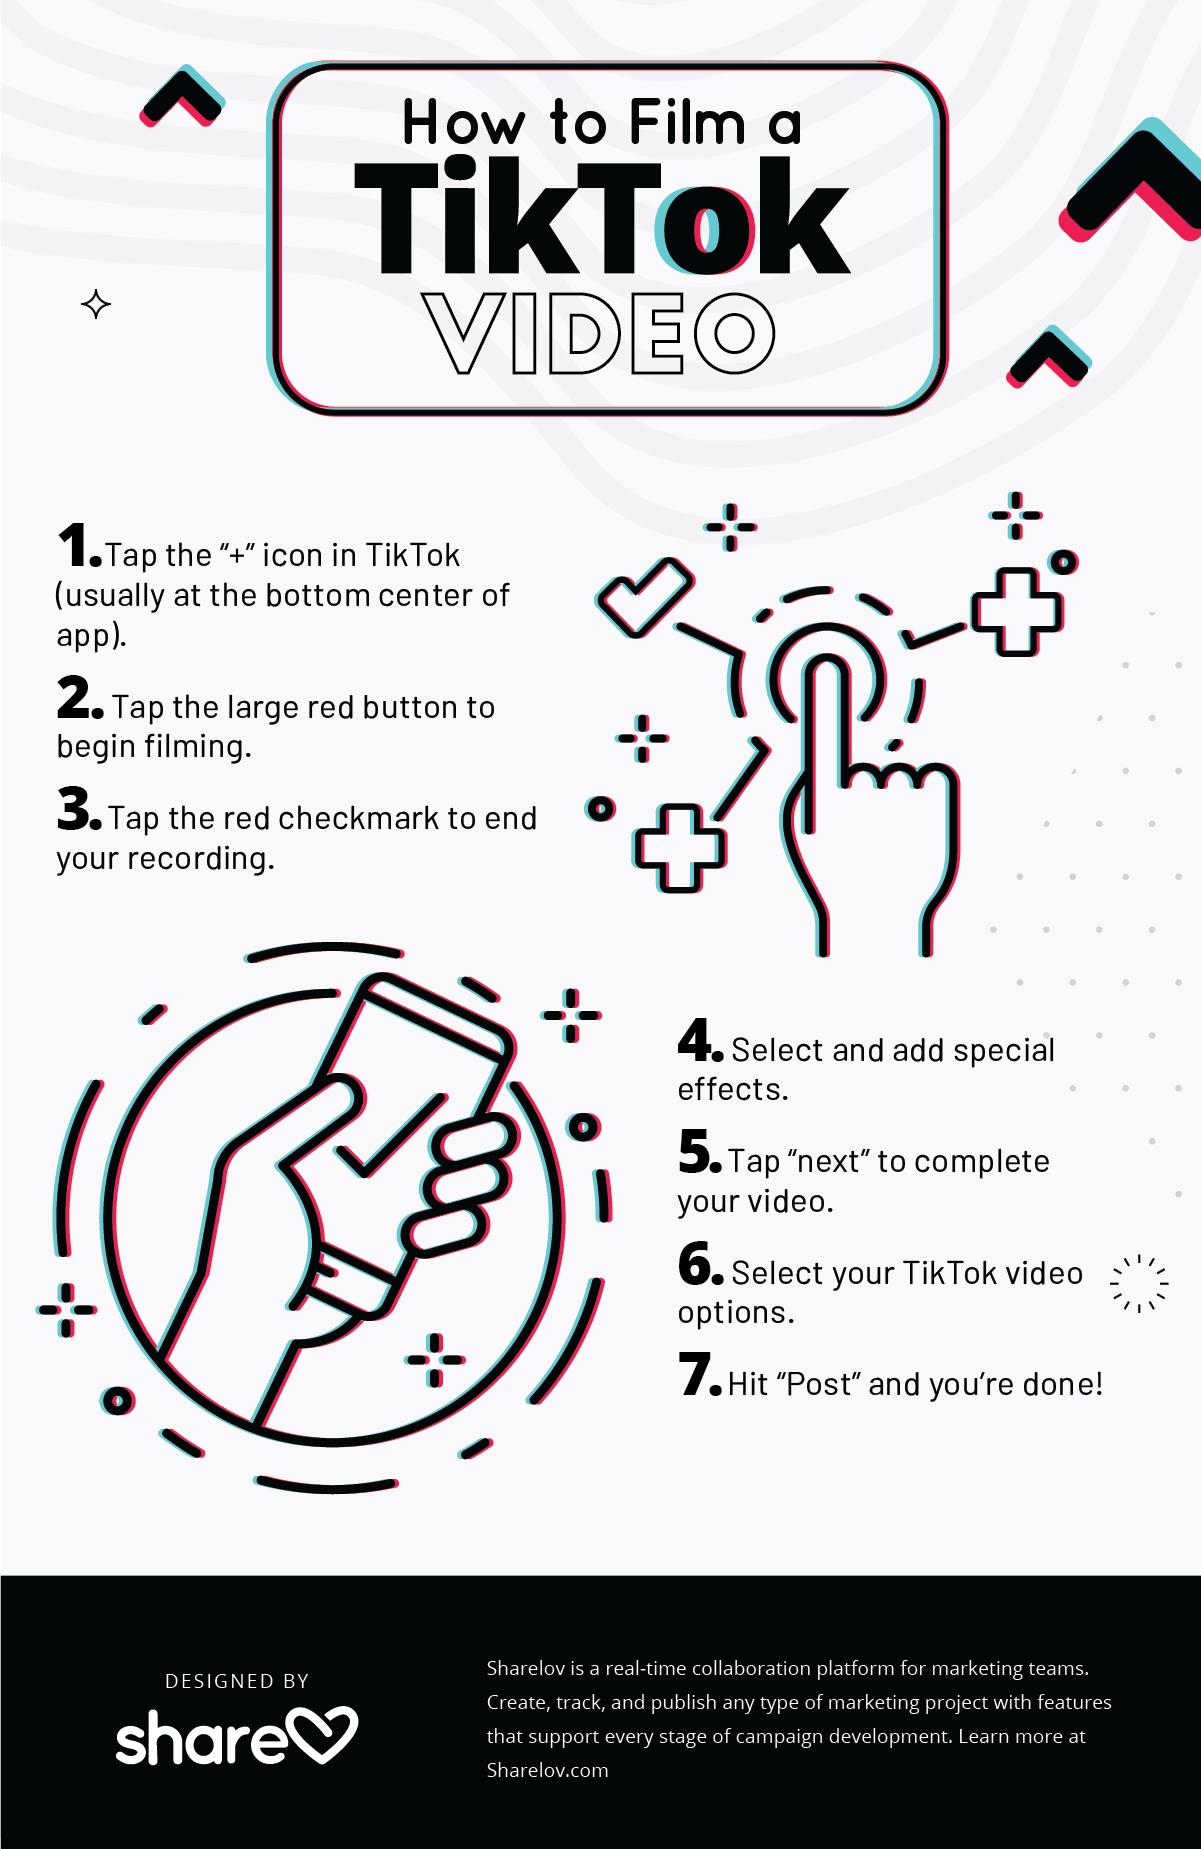 how-to-film-a-TikTok-video